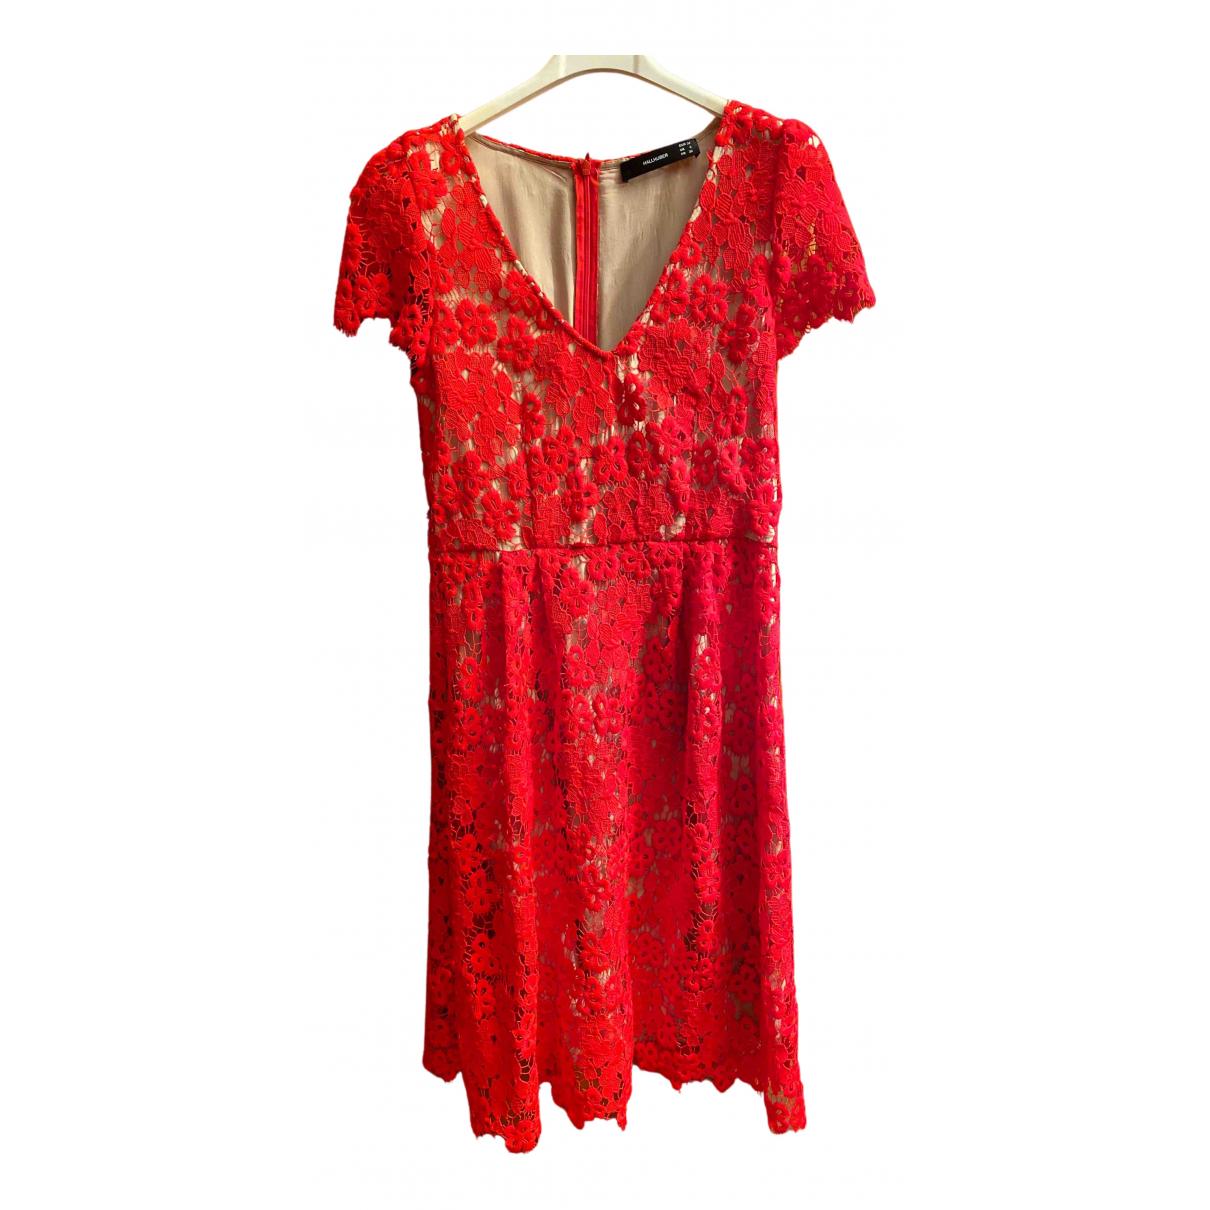 Hallhuber \N Kleid in  Rot Polyester